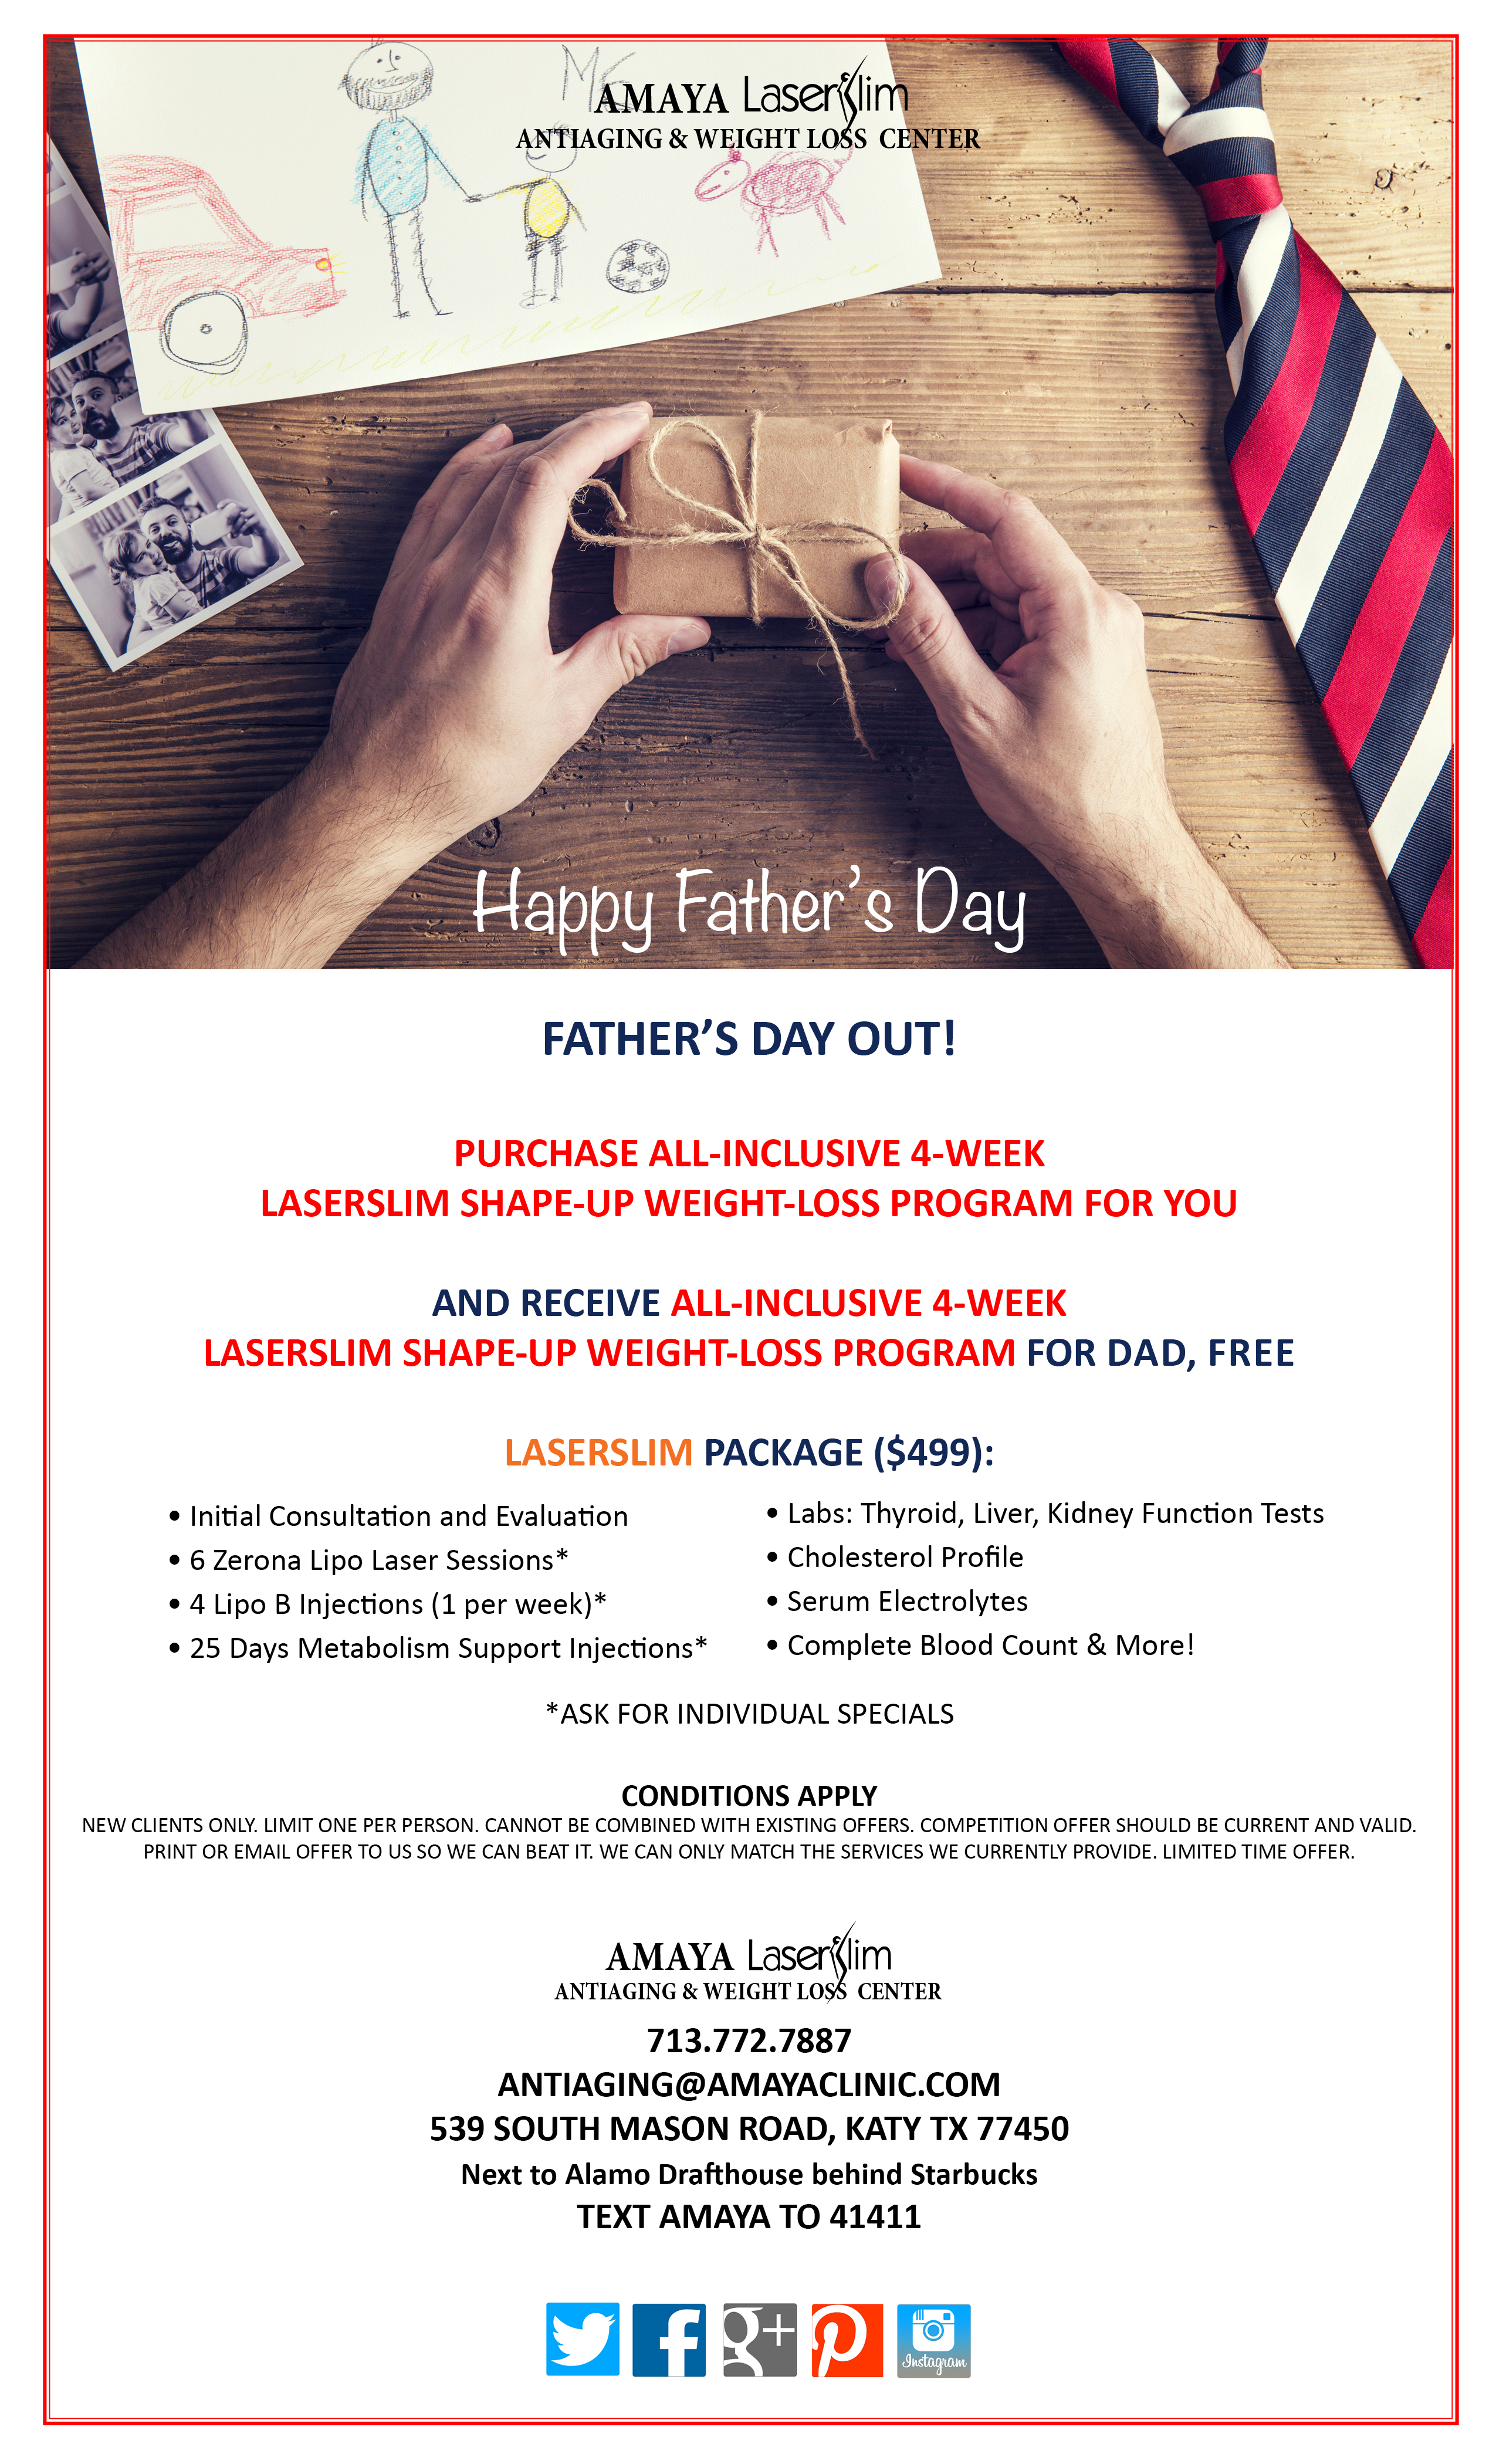 FathersDayWhole